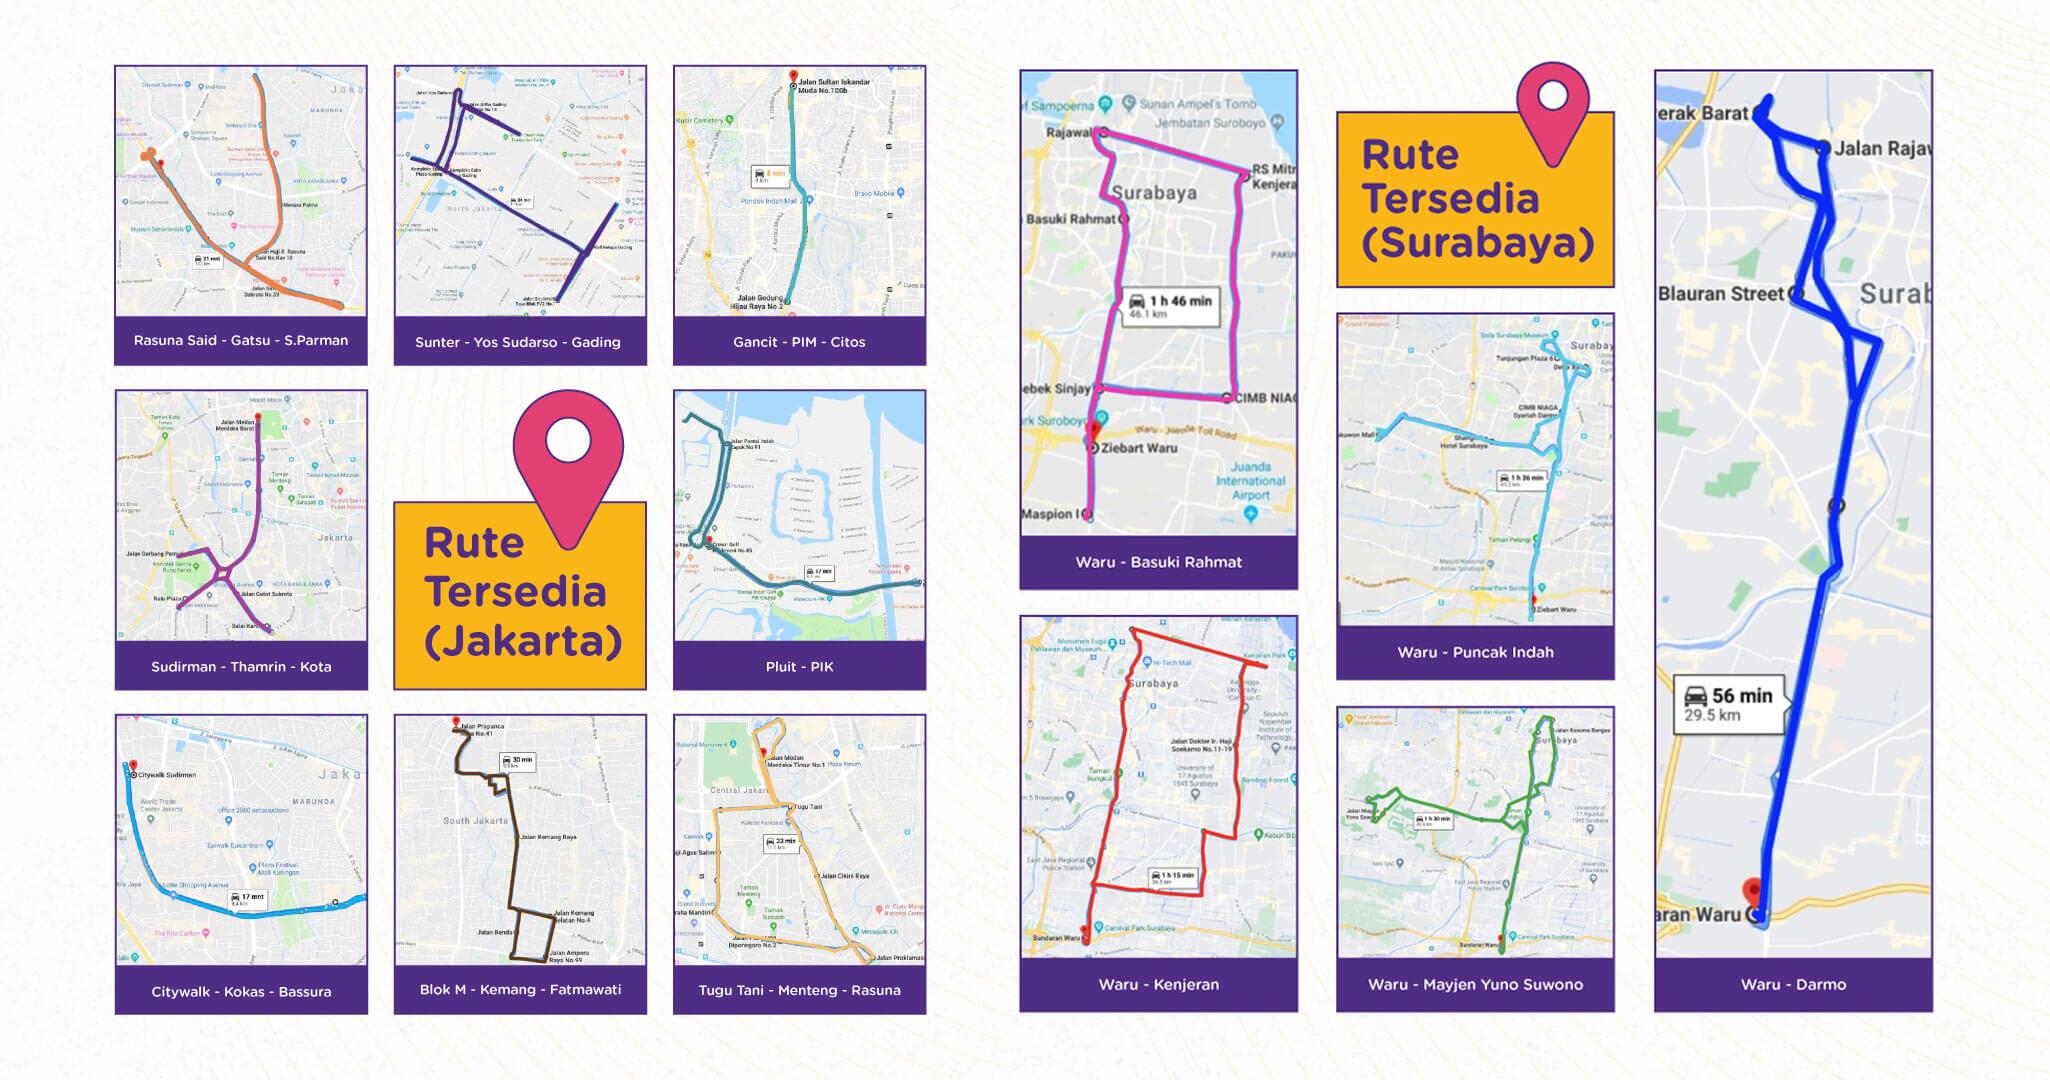 Artikel_20210601-(Alasan-Brand-Memilih-Mobile-LED)_Image-rute-Jakarta-Surabaya.jpg